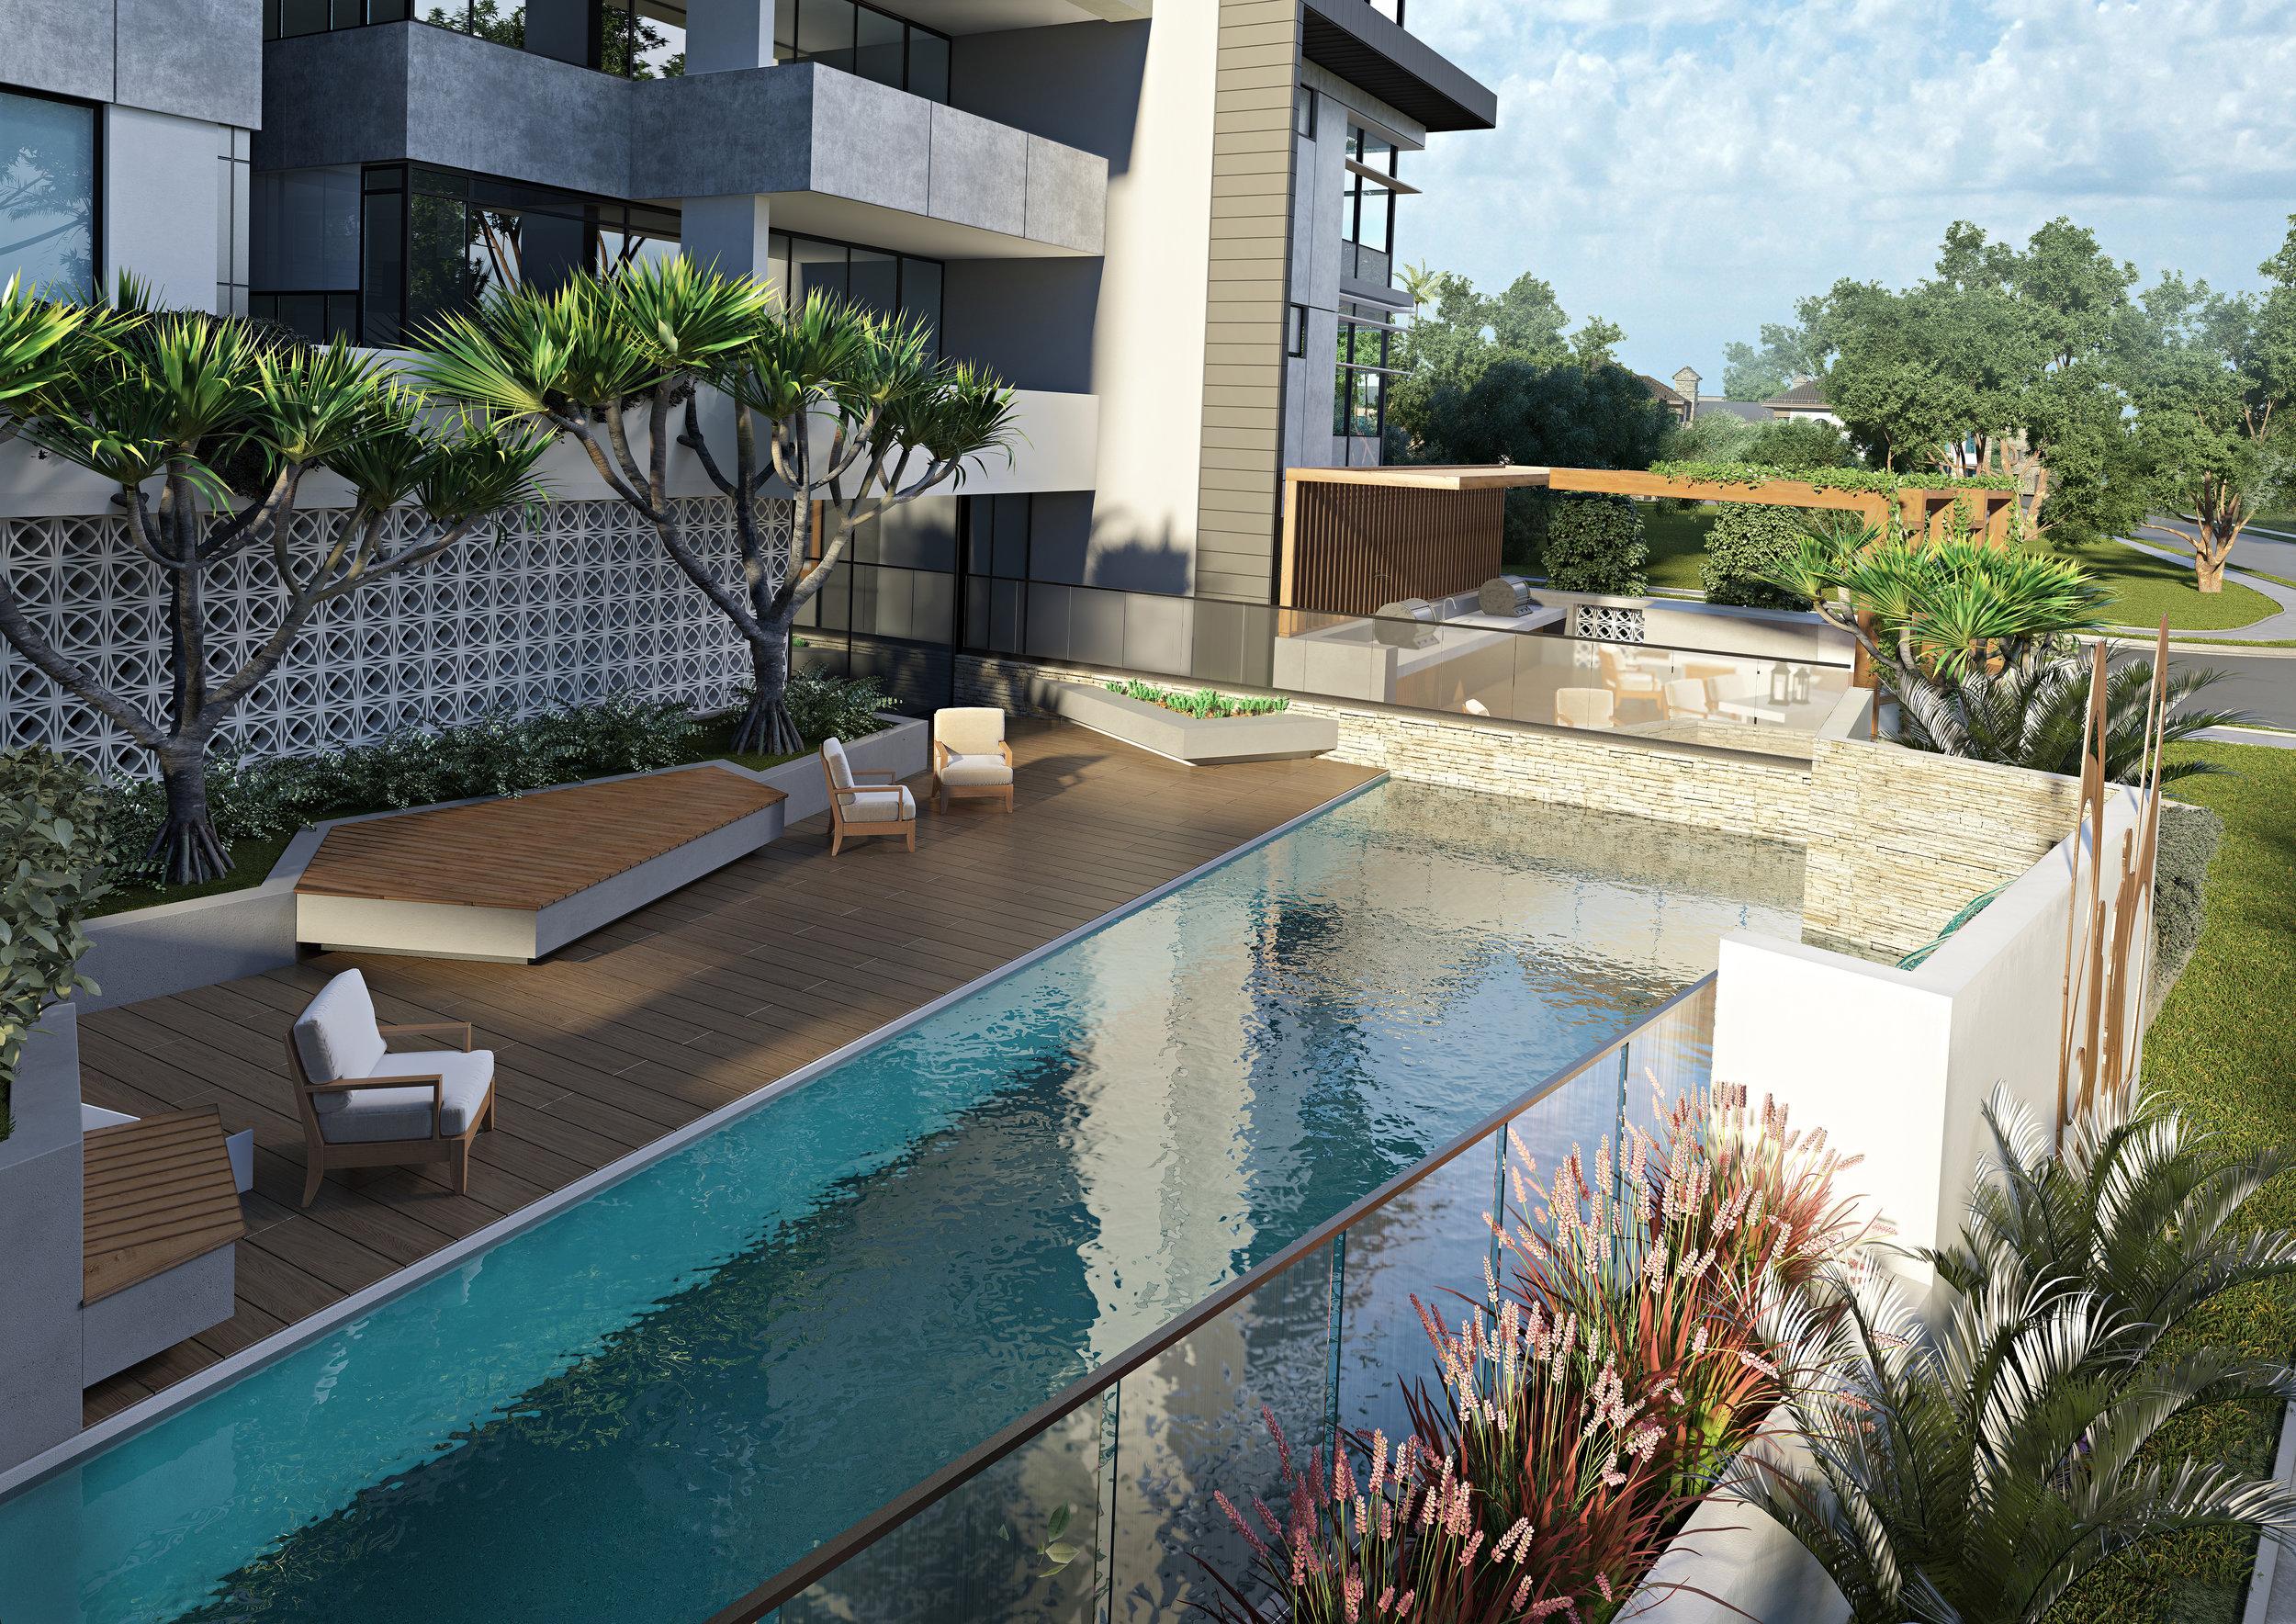 Zinc_Pool & Recreation area.jpg